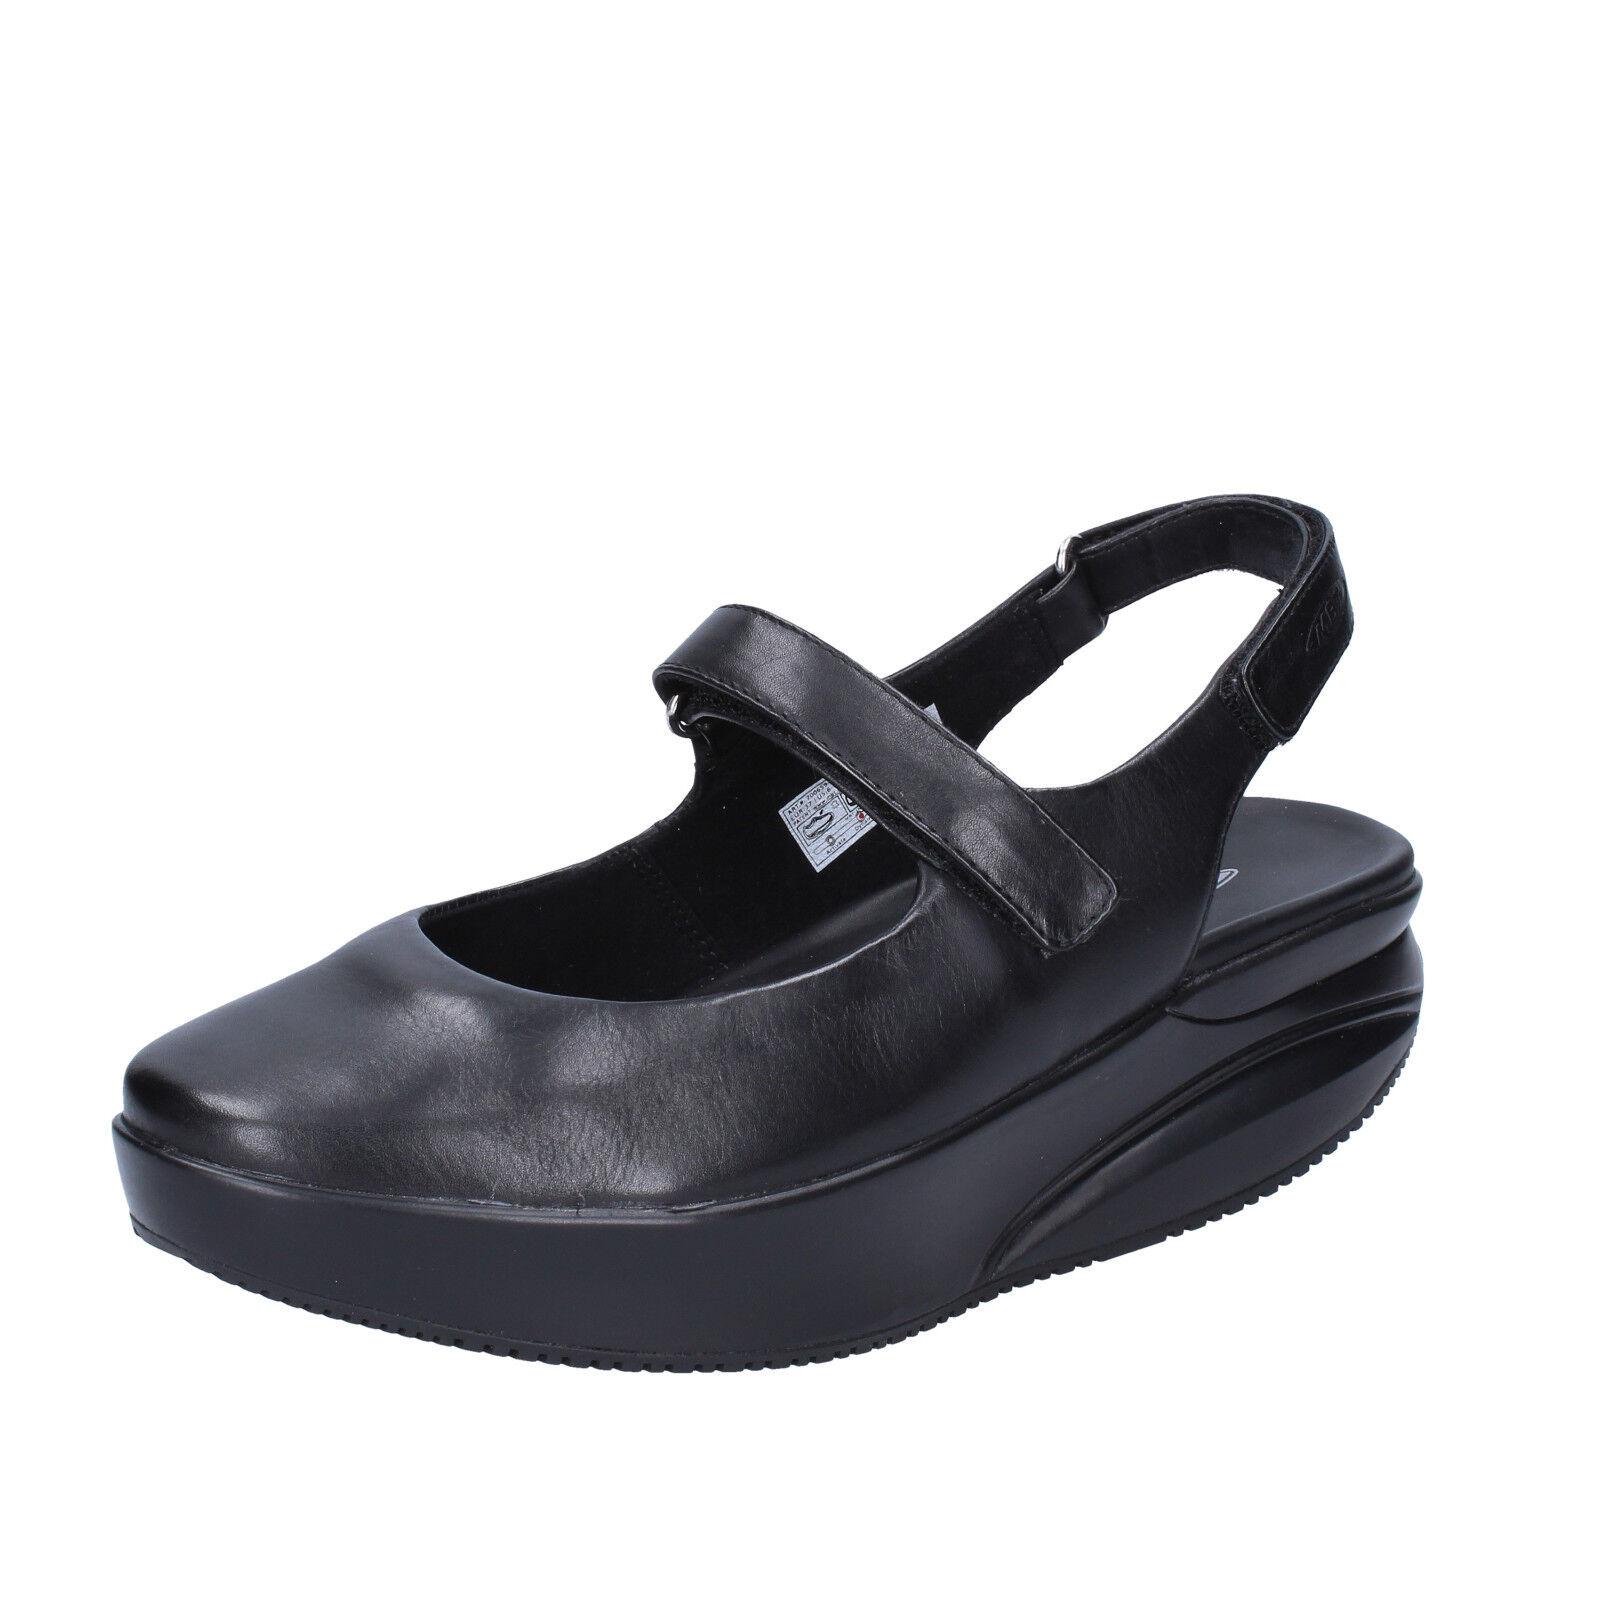 Women's shoes MBT 4   4,5 (EU 35) 35) 35) flats black leather dynamic BX889-35 0aa1e8